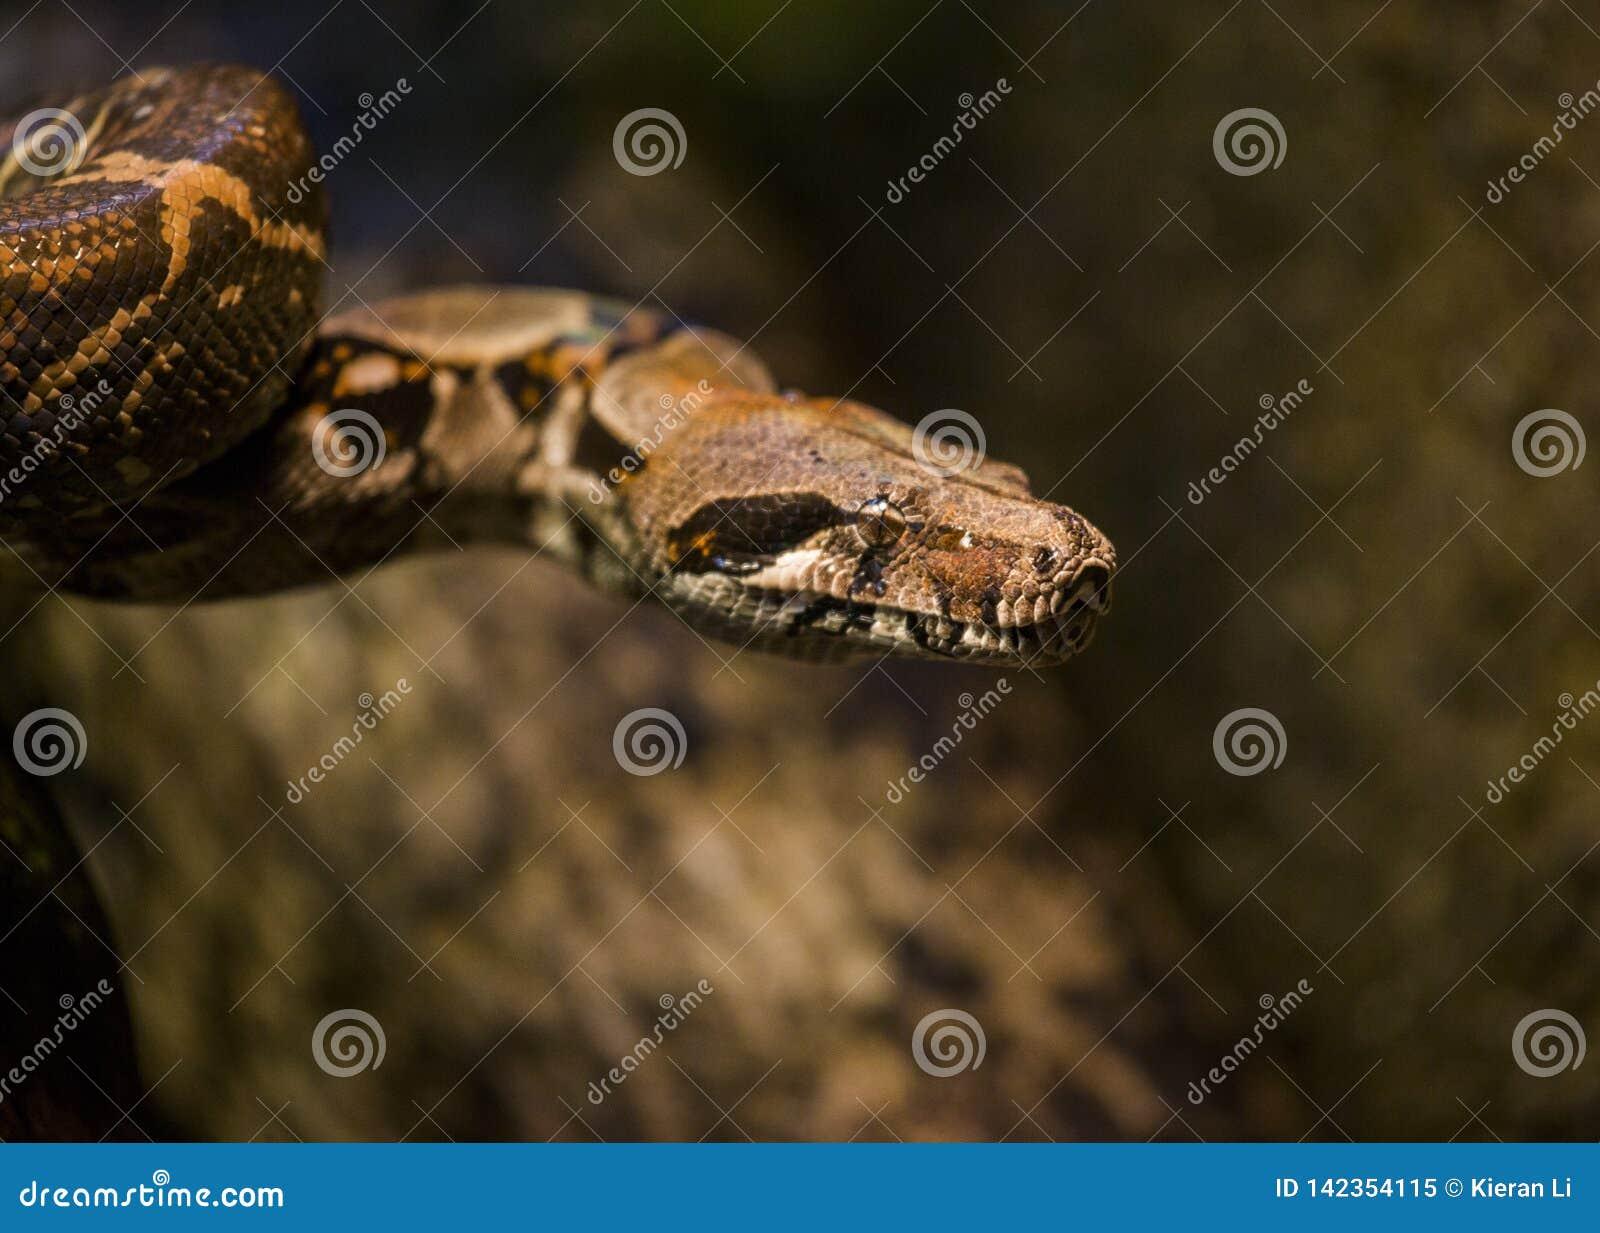 Boa- constrictorBoa constrictor